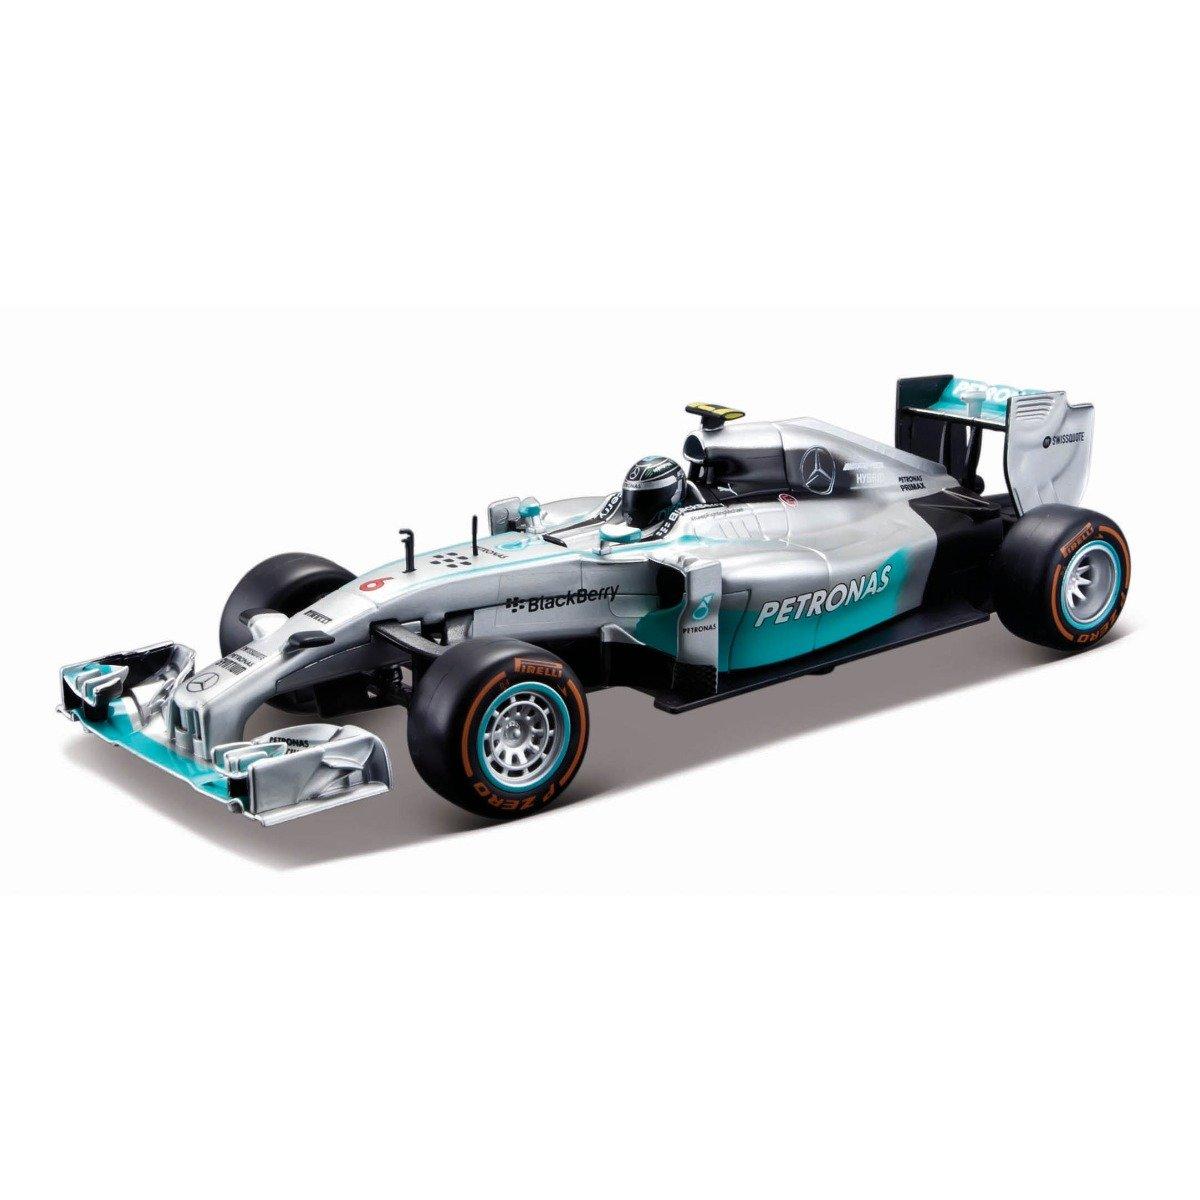 Masinuta cu telecomanda Maisto Mercedes F1W05, 1:24, 27 MHz